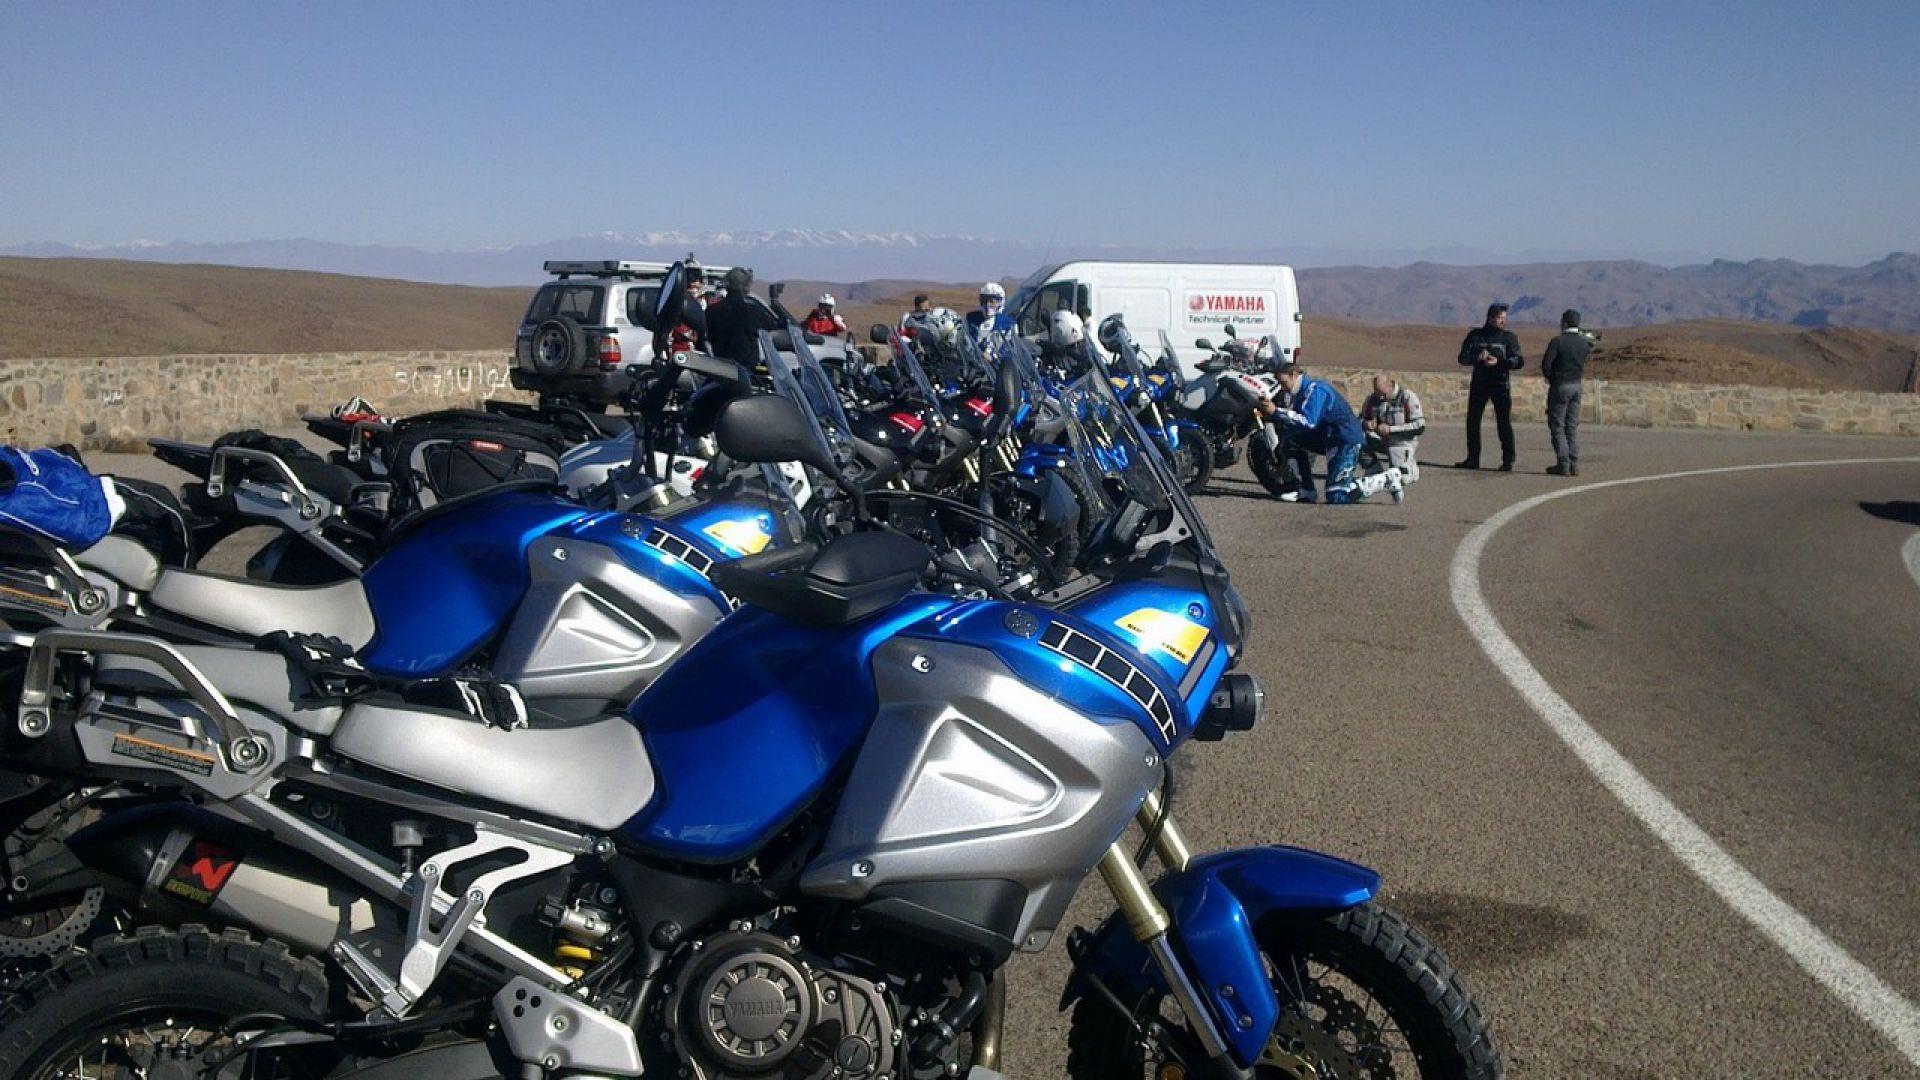 Immagine 159: In Marocco con la Yamaha Super Ténéré